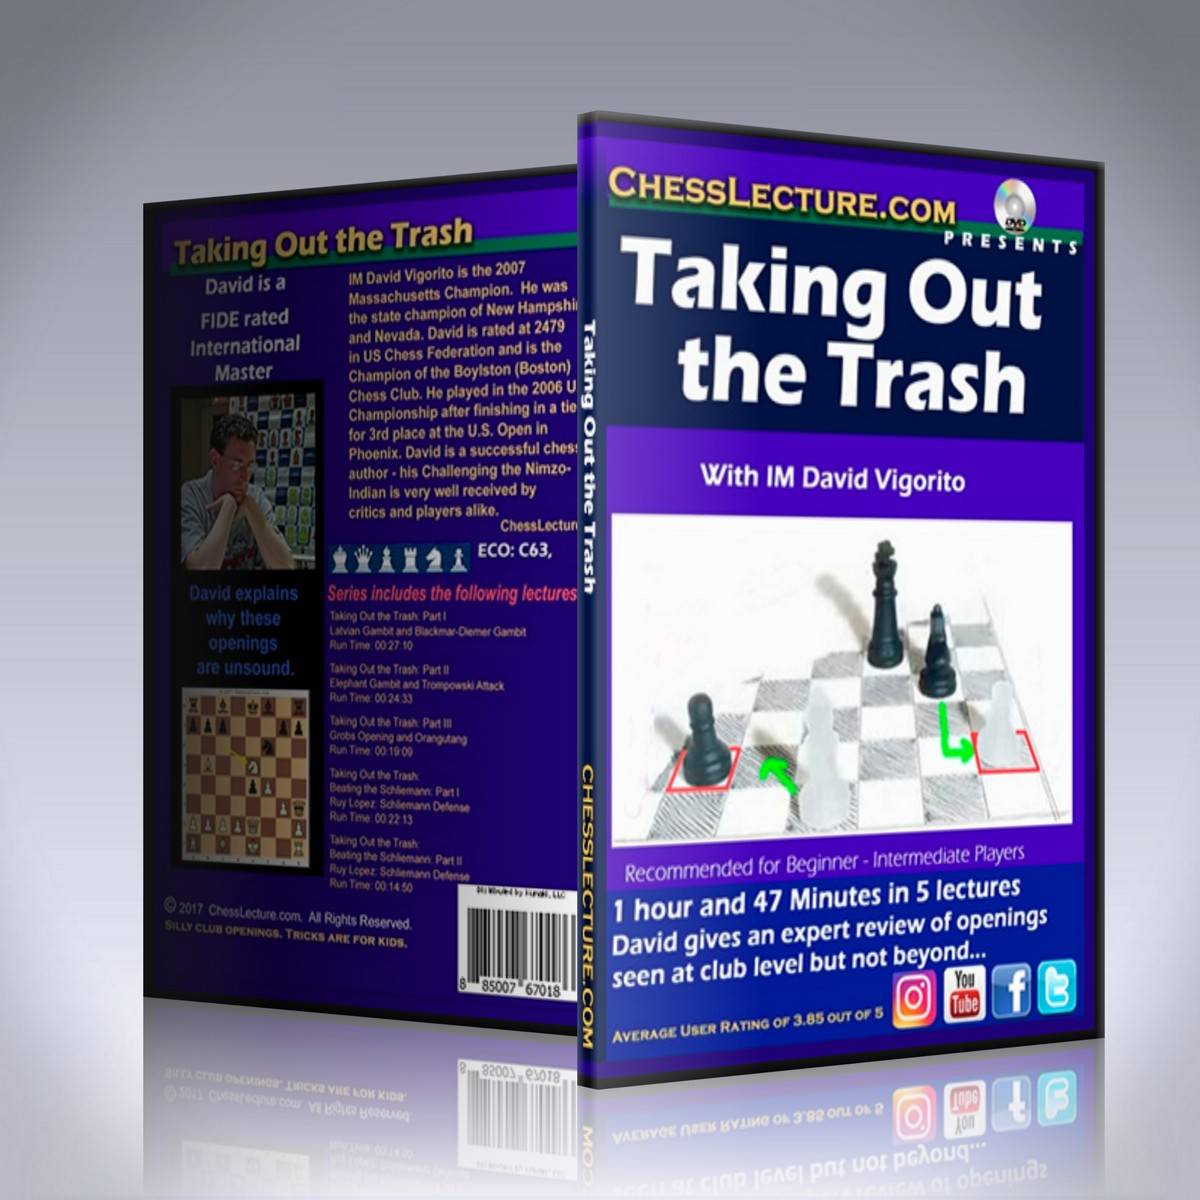 Taking Out the Trash – IM David Vigorito